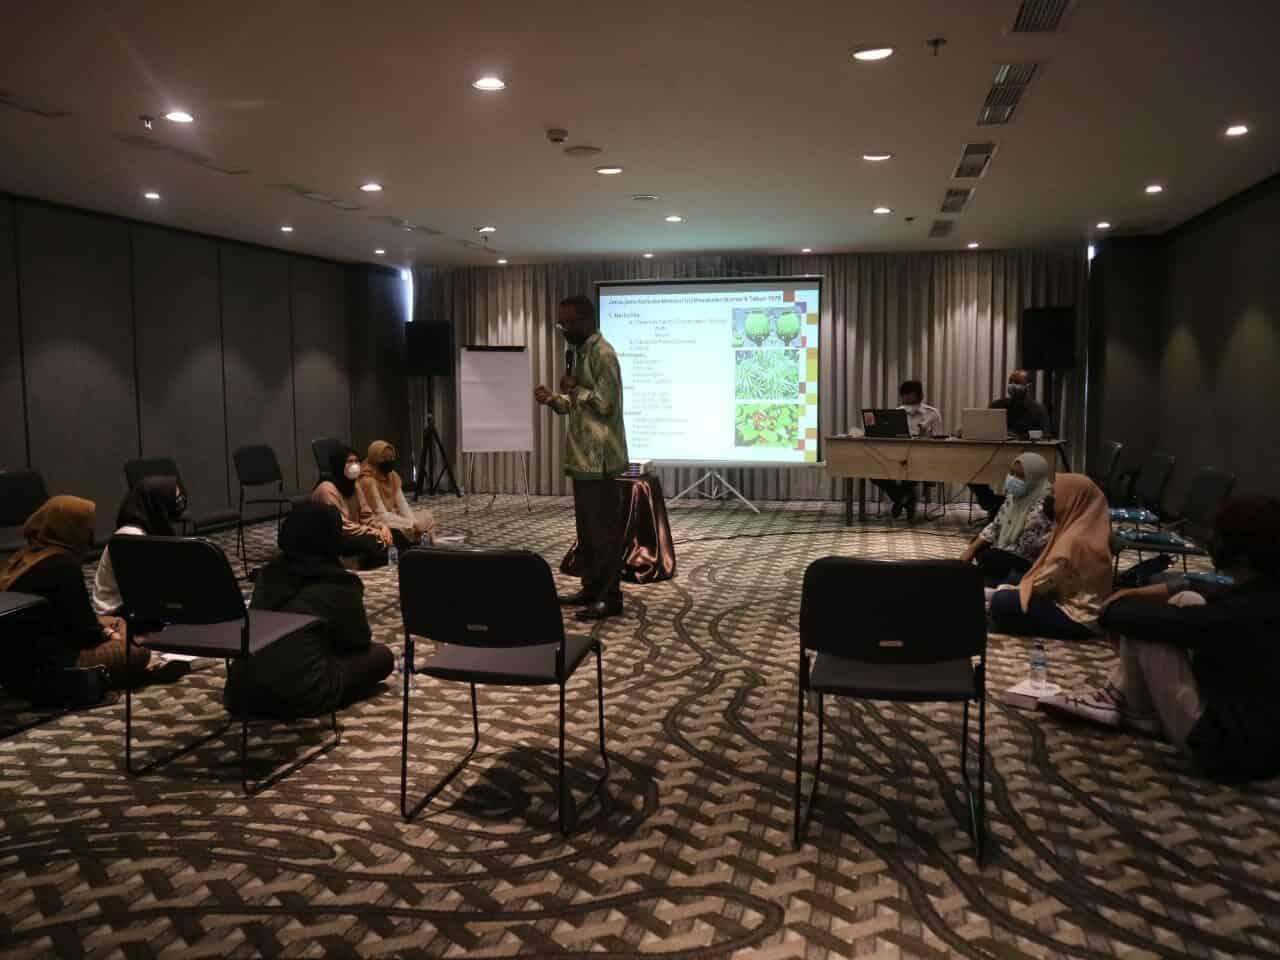 Dialog Interaktif Pembentukan Remaja Teman Sebaya Anti Narkotika